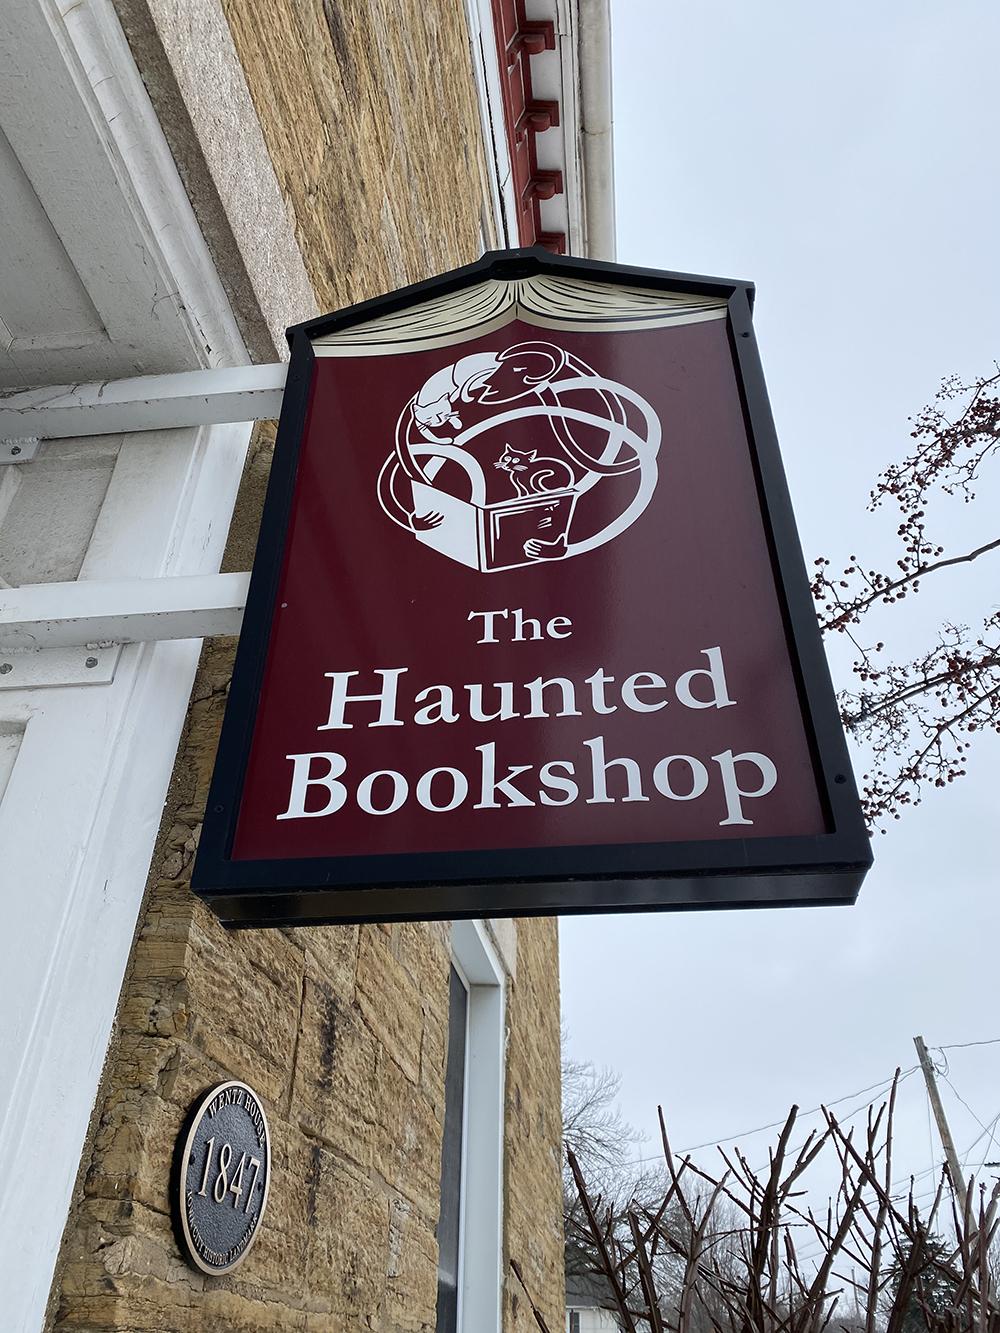 Maroon sign for The Haunted Bookshop in Iowa City, Iowa